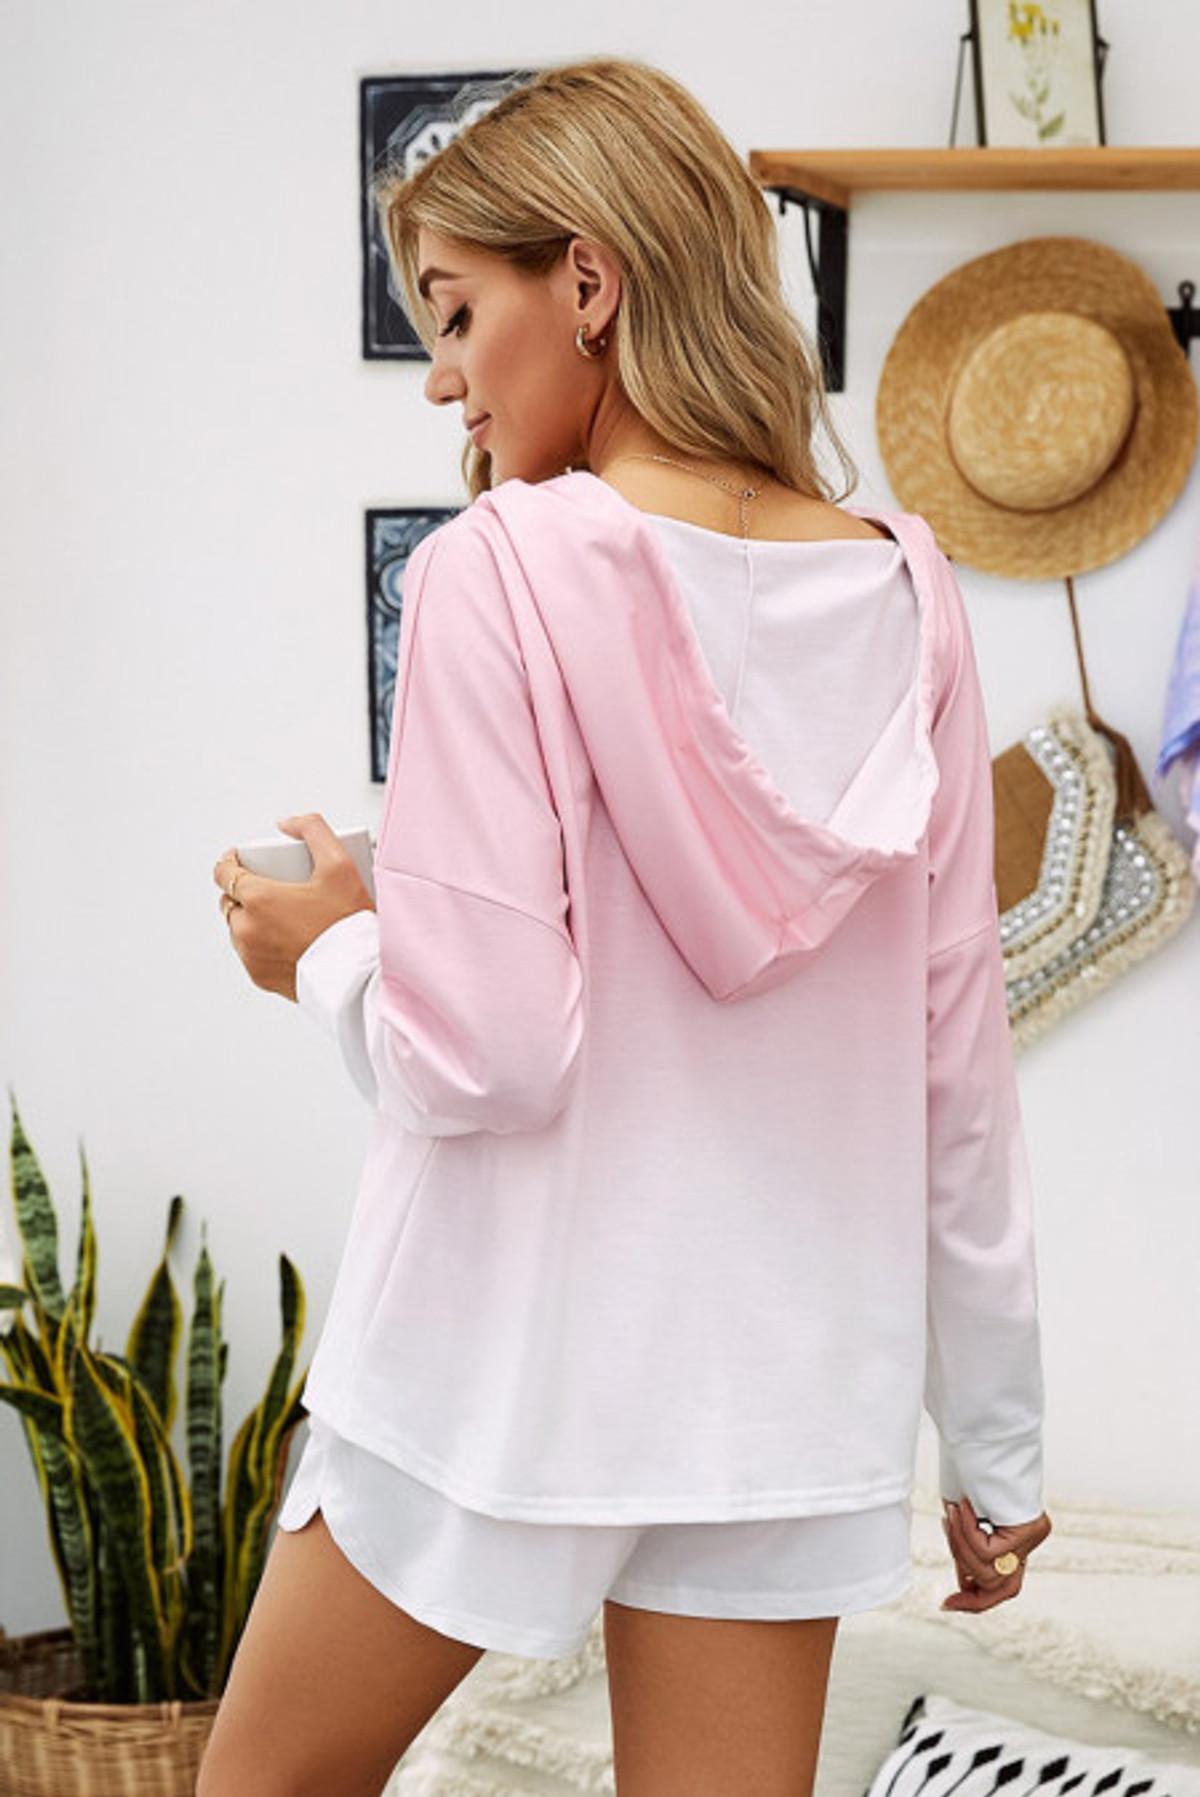 Ombre Hooded Lounge Sweatshirt & Shorts Set (FRE45068-10)  FRE4506810P2XL